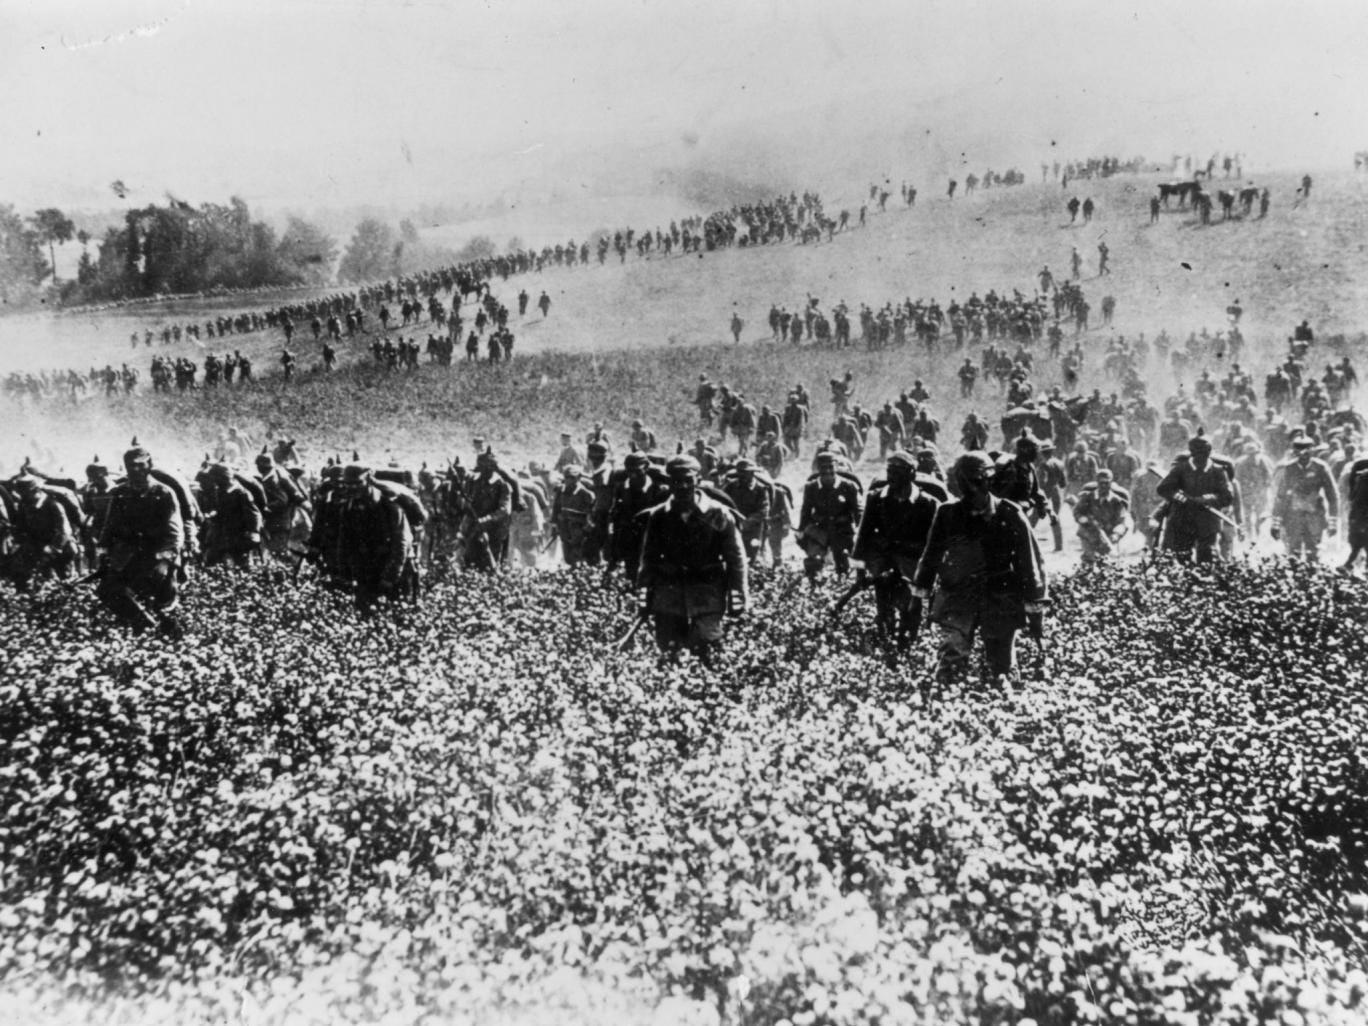 German infantry advance through Belgium in August 1914